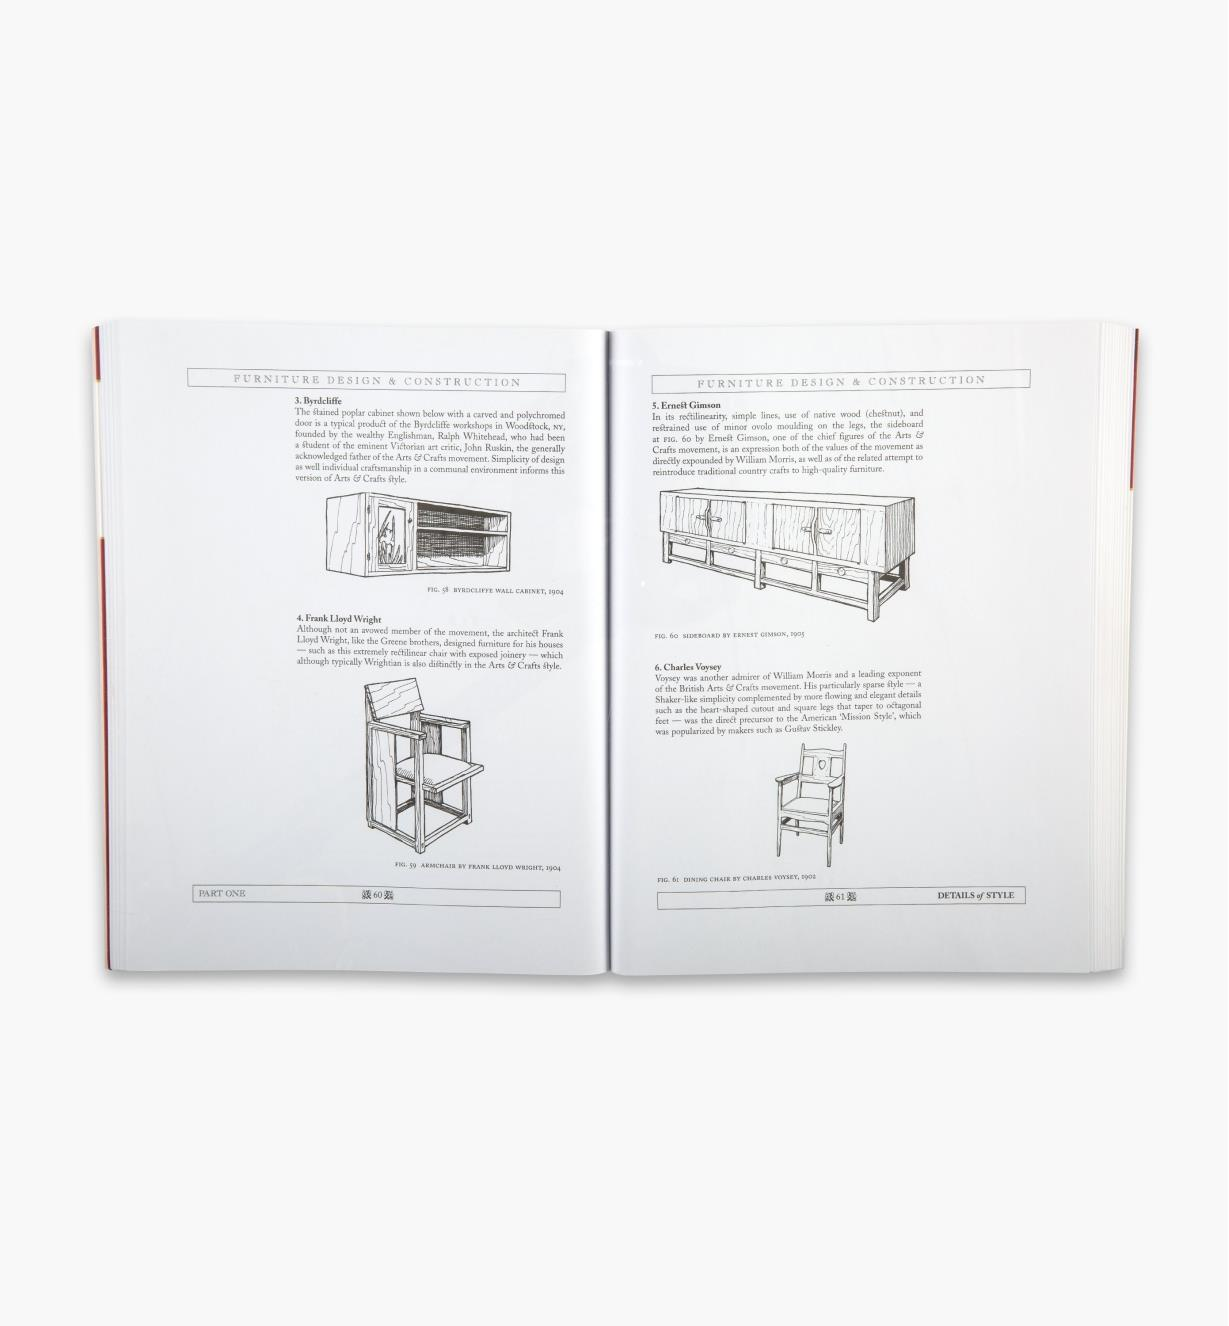 49L2731 - Furniture Design & Construction